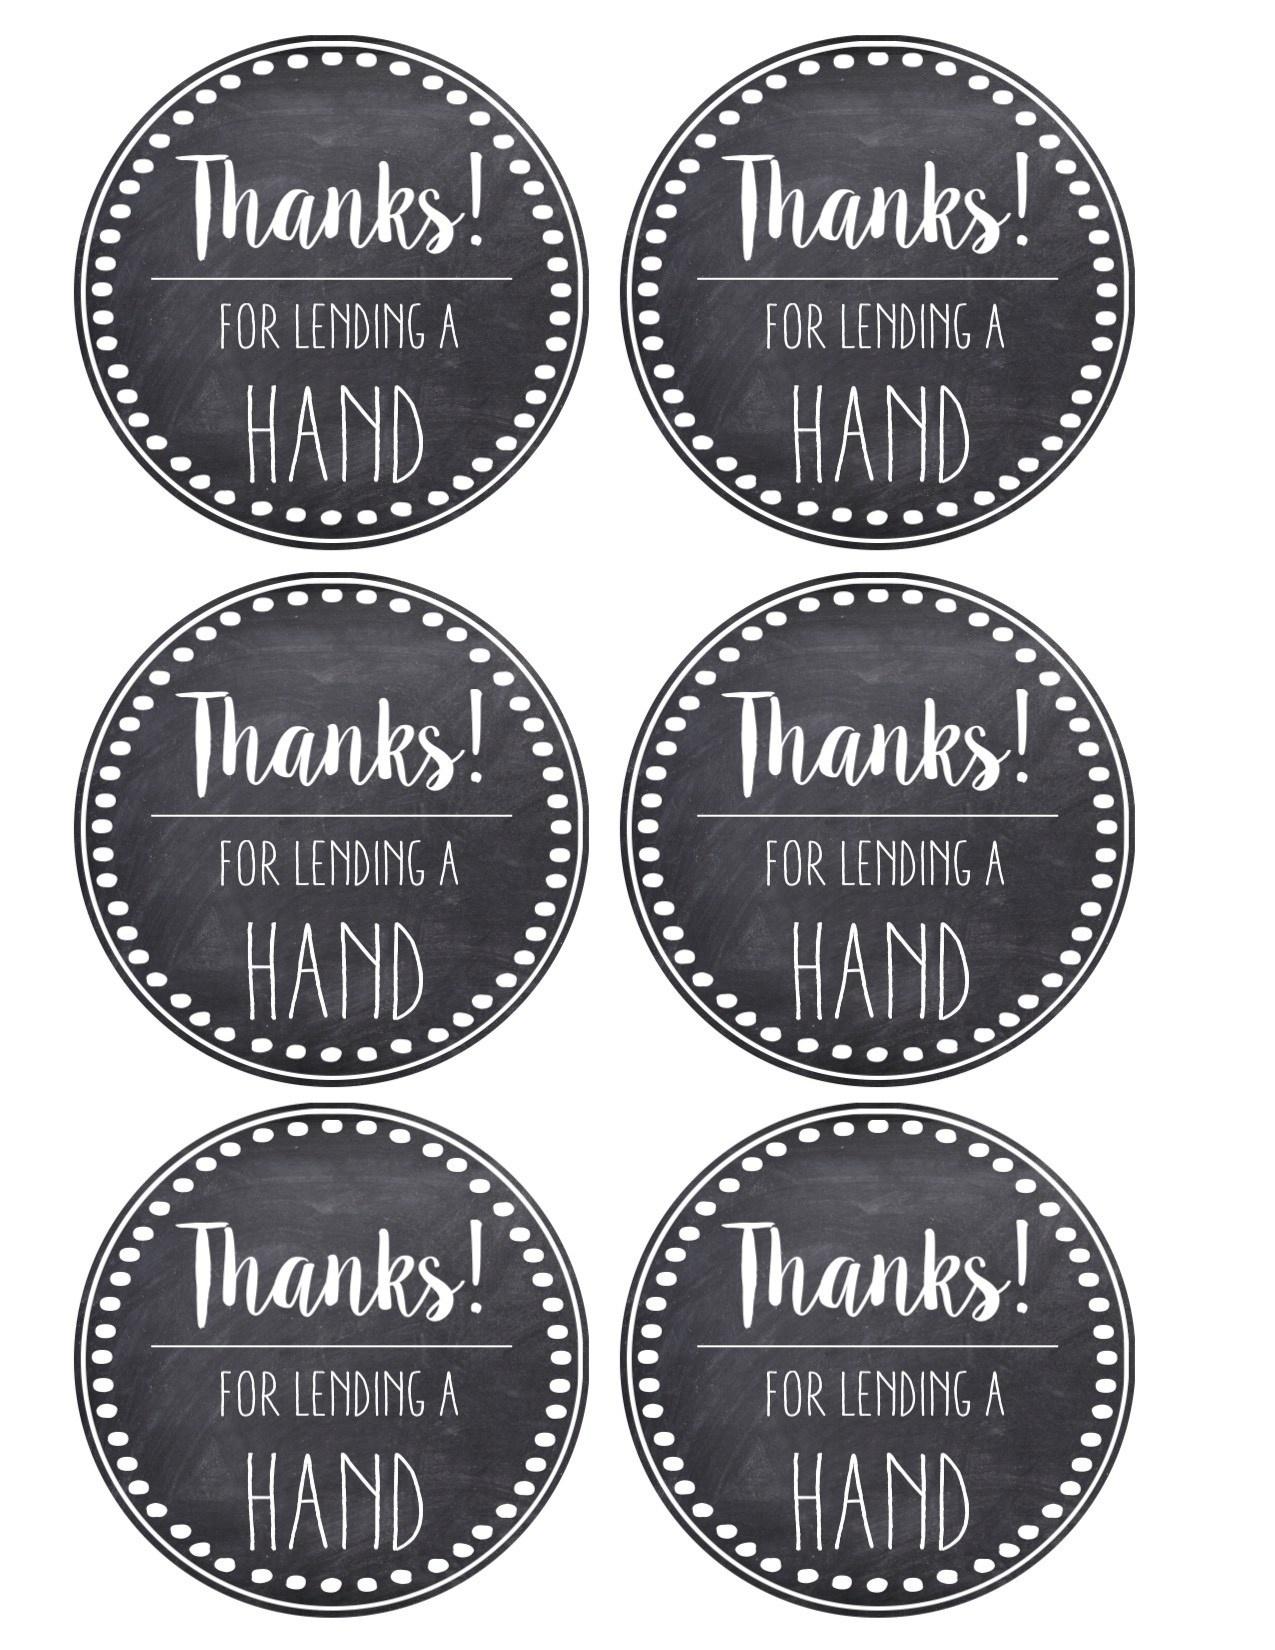 Thank You & Teacher Appreciation Tags Free Printable - Paper Trail - Free Printable Thank You Tags